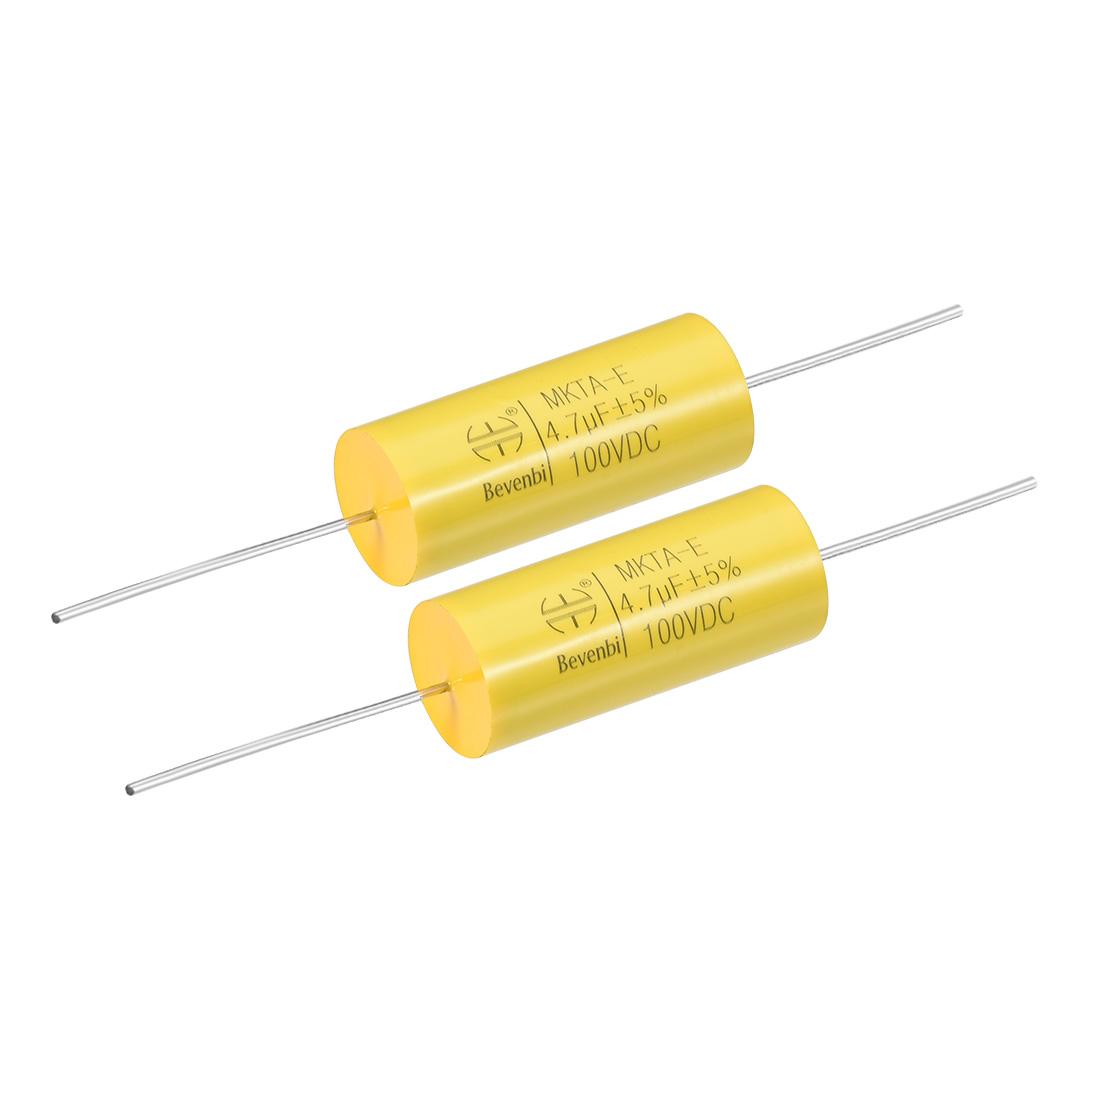 Film Capacitor 100V DC 4.7uF MKTA-E Round Polypropylene Capacitors Yellow 2pcs